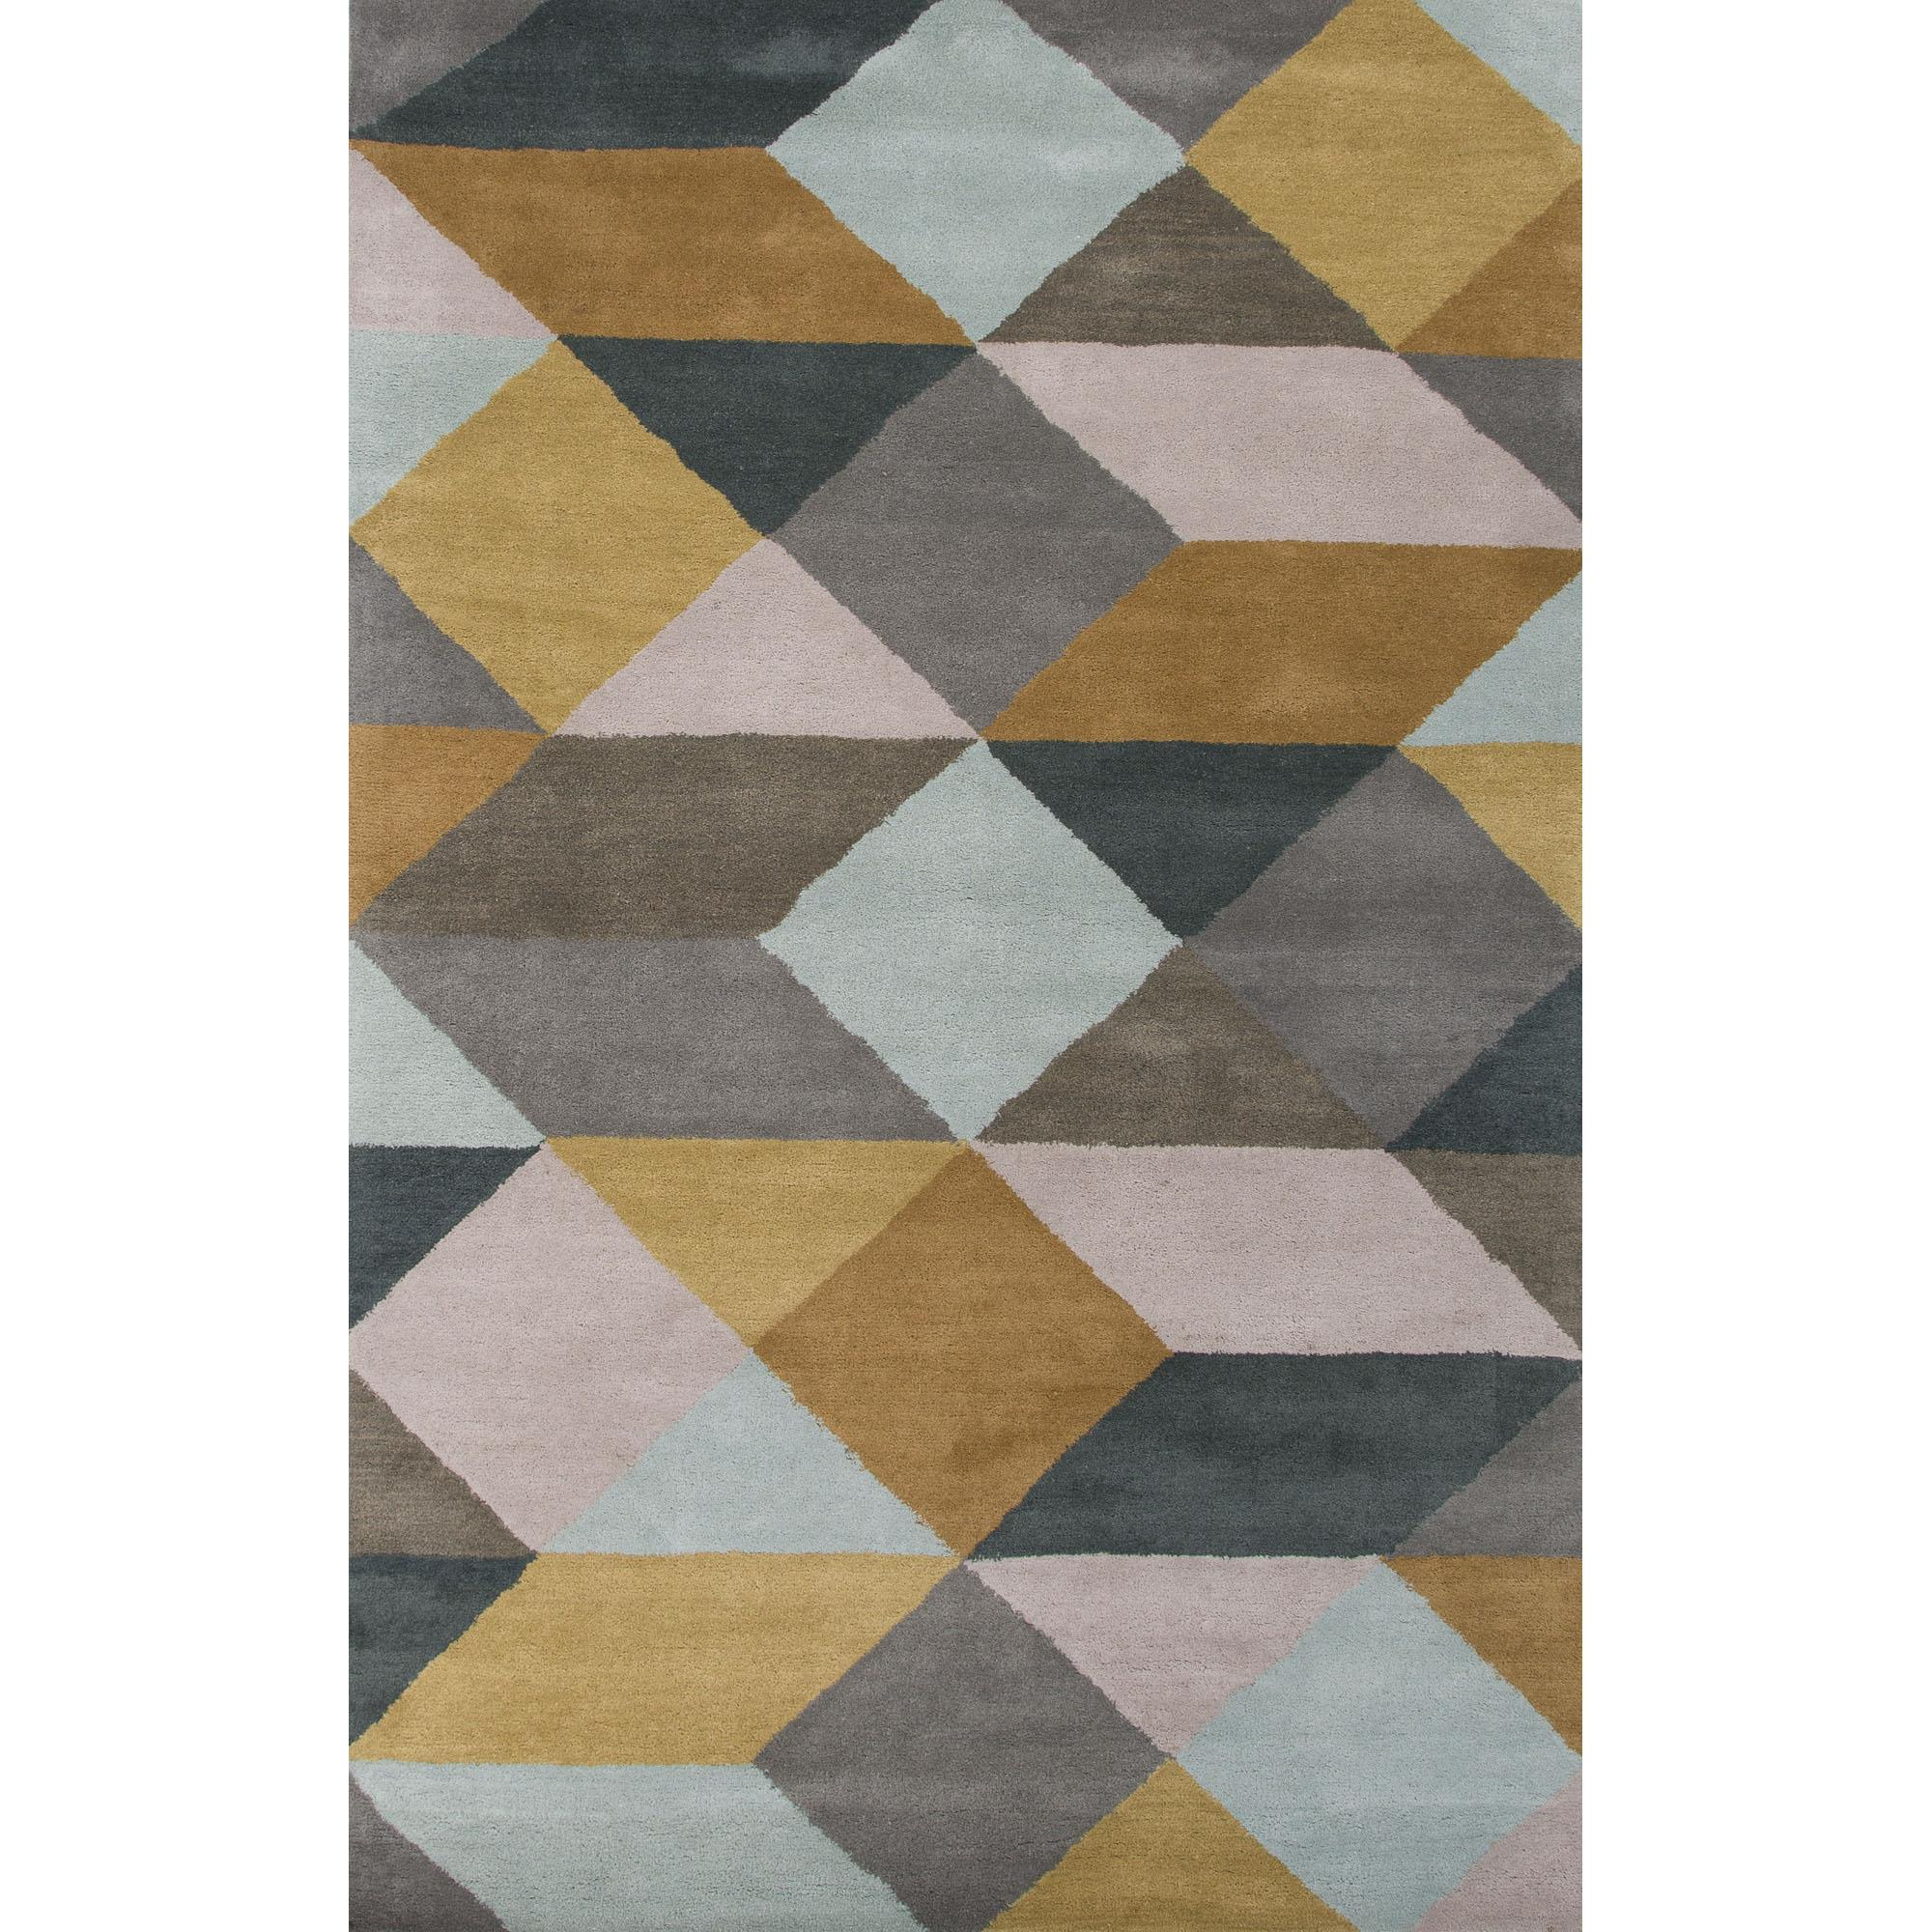 JAIPUR Rugs En Casa By Luli Sanchez Tufted 8 x 11 Rug - Item Number: RUG116795